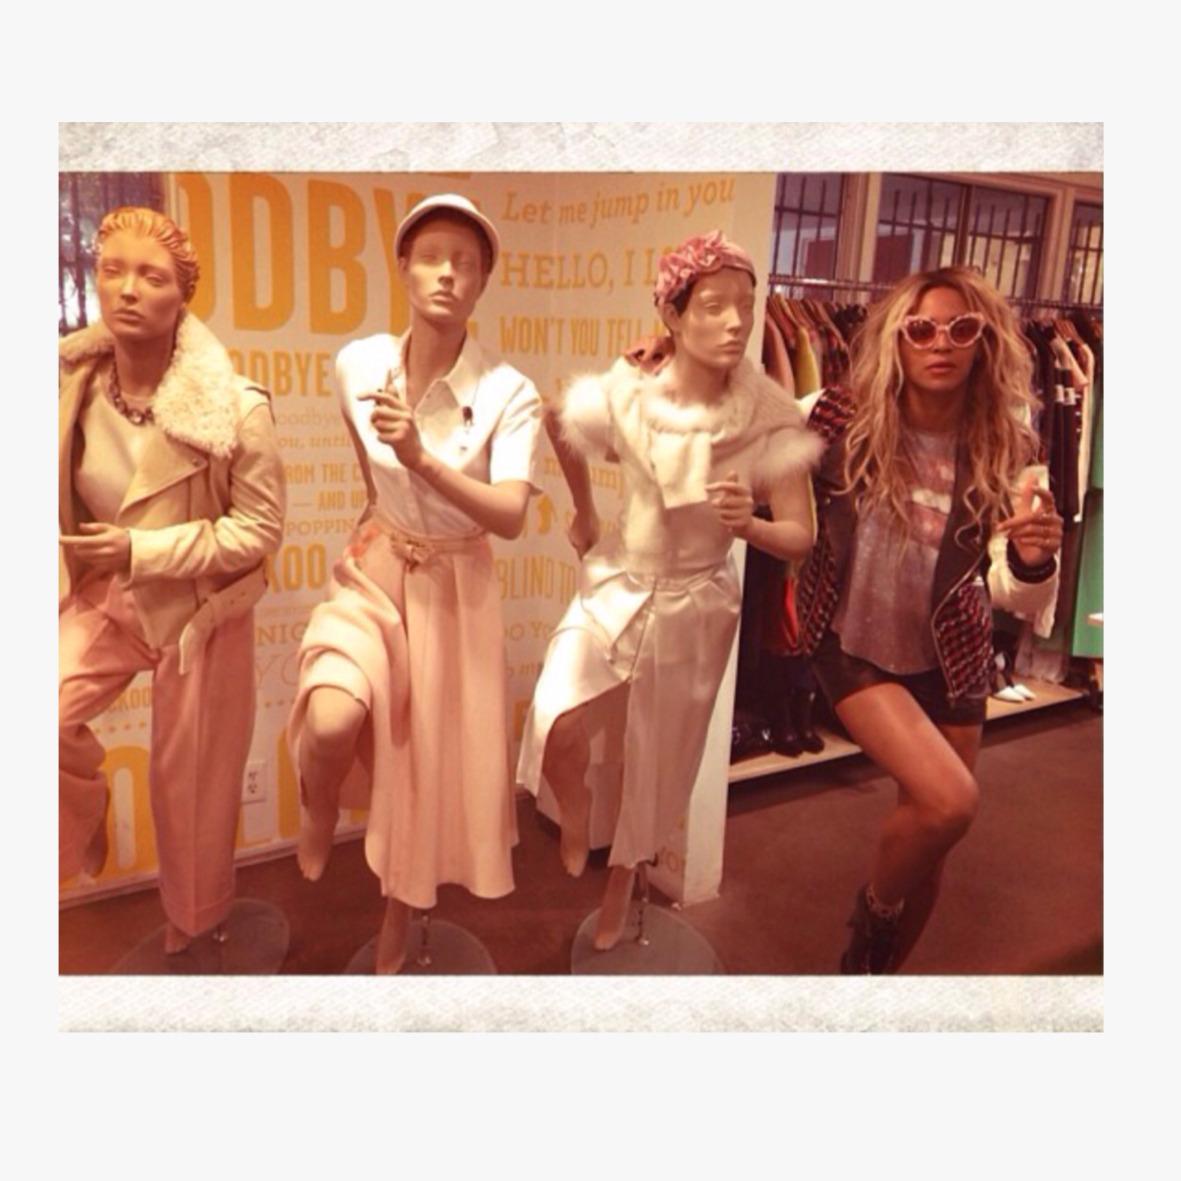 Beyoncé - Twitter (@Beyonce), Instagram (Baddiebey), Tumblr (I Am...) - Página 49 Tumblr_mxiw32upgo1t2kw8no1_1280